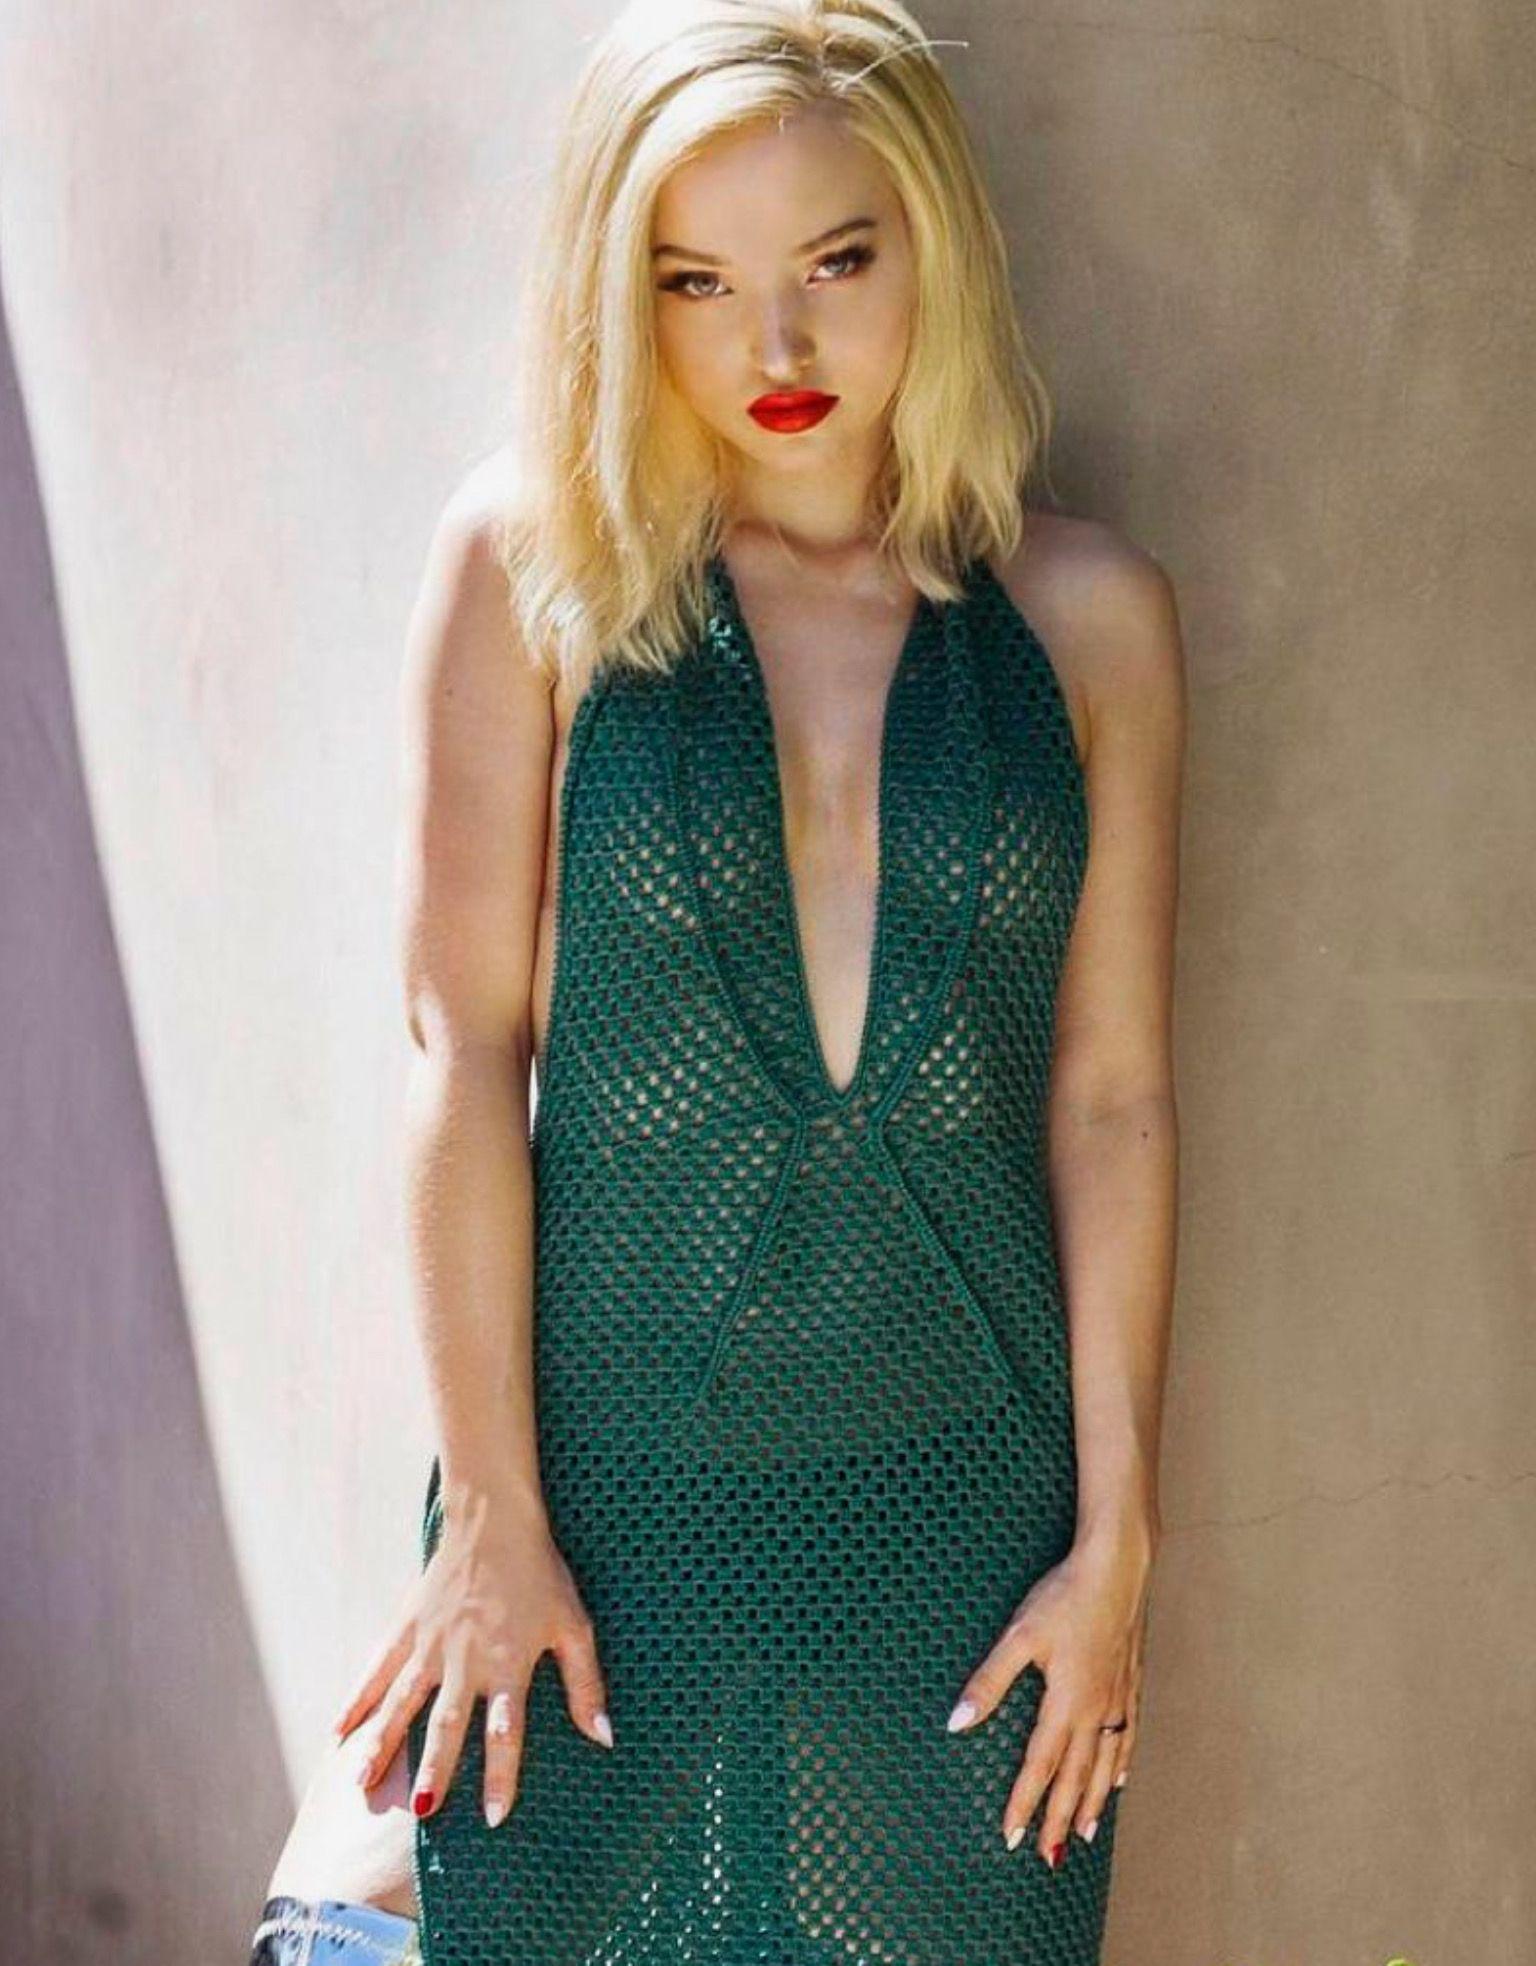 Boobs Hot Dove Cameron naked photo 2017